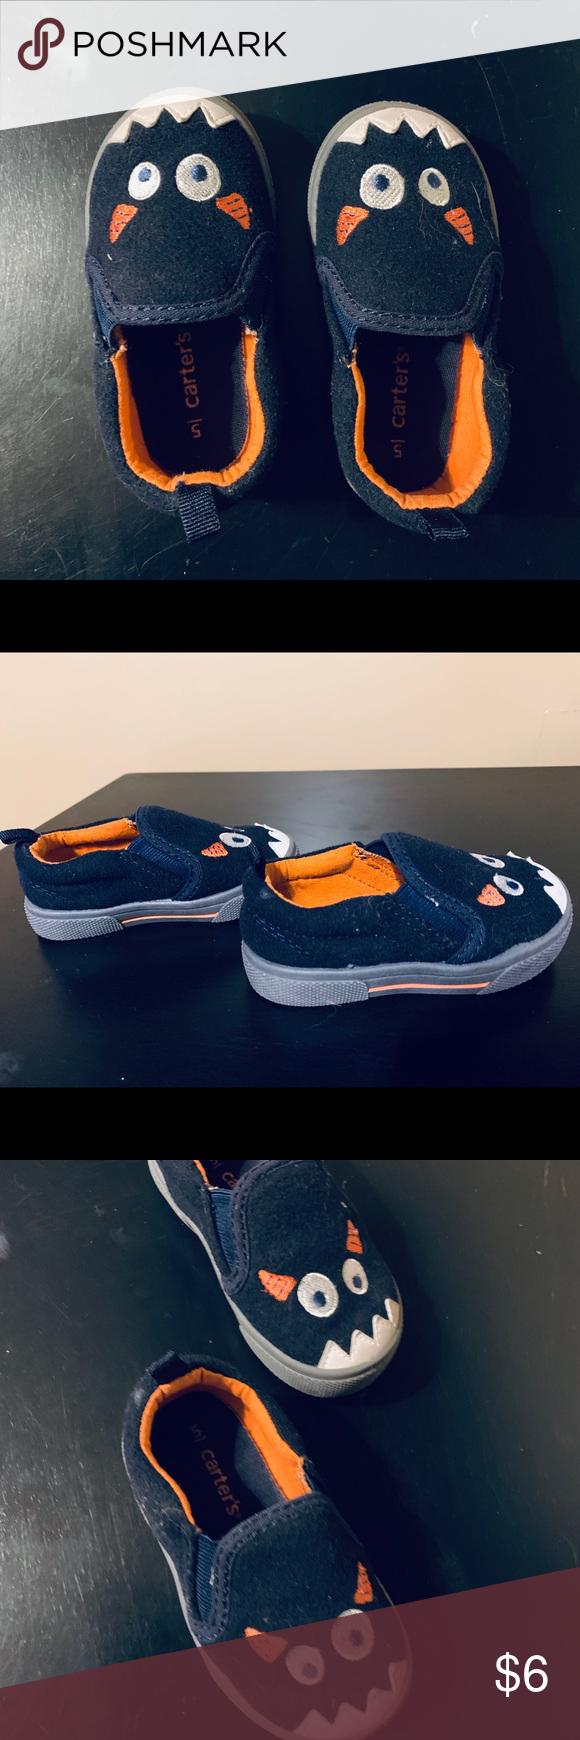 d5da803b4 Carters Toddler boy sz 5 monster shoes Excellent condition! Worn ...